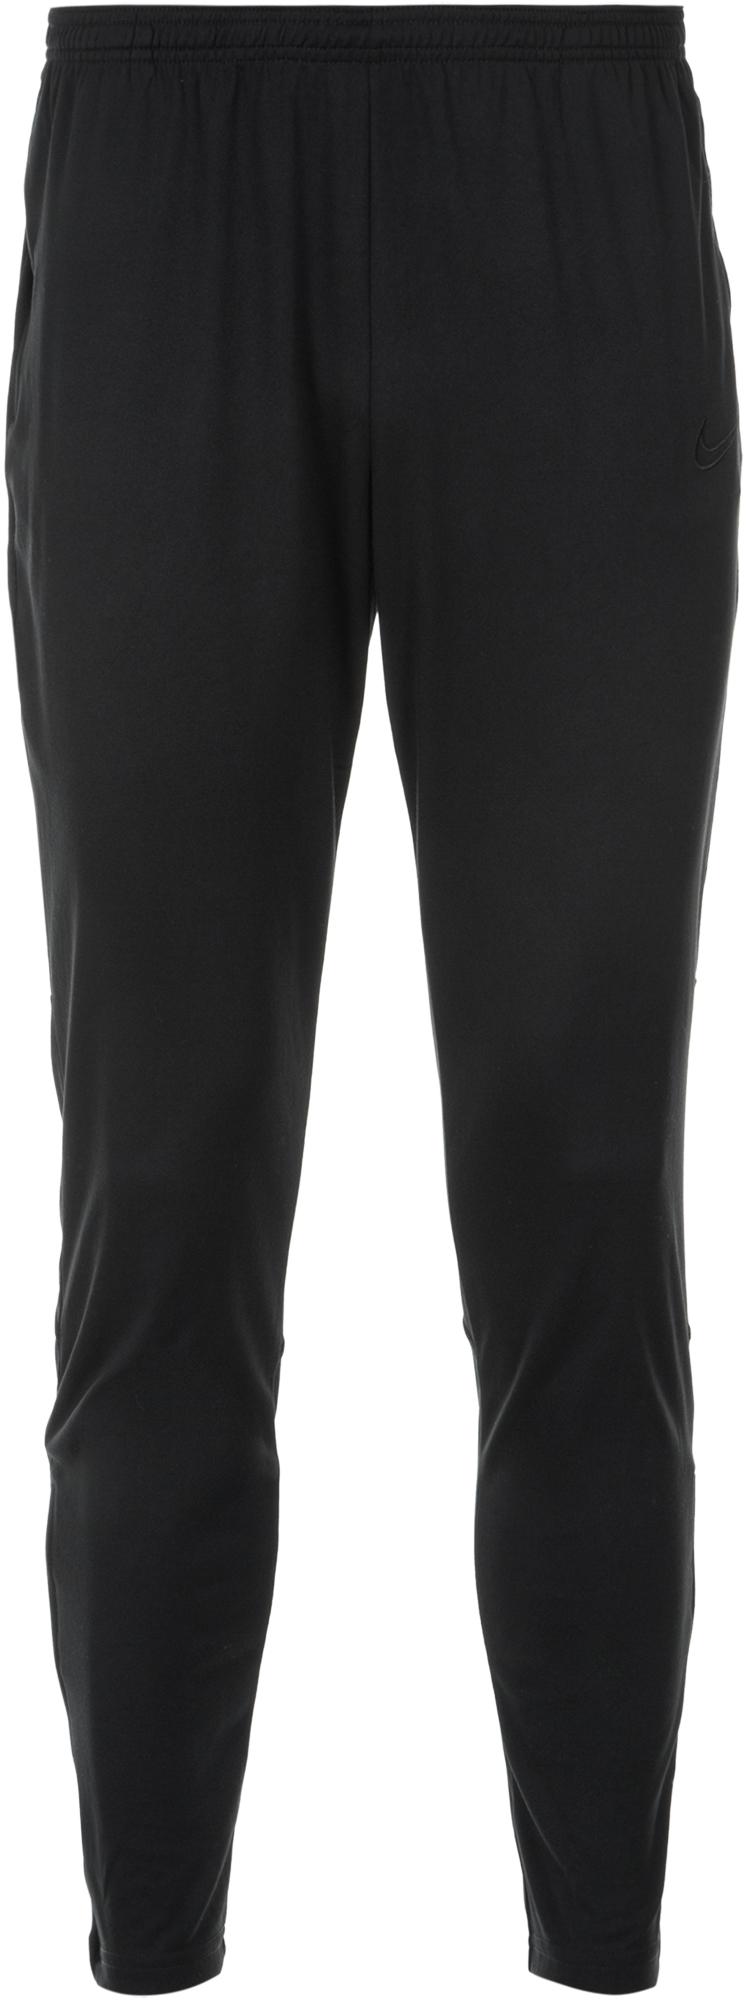 Nike Брюки мужские Nike Academy, размер 52-54 nike перчатки мужские nike размер l